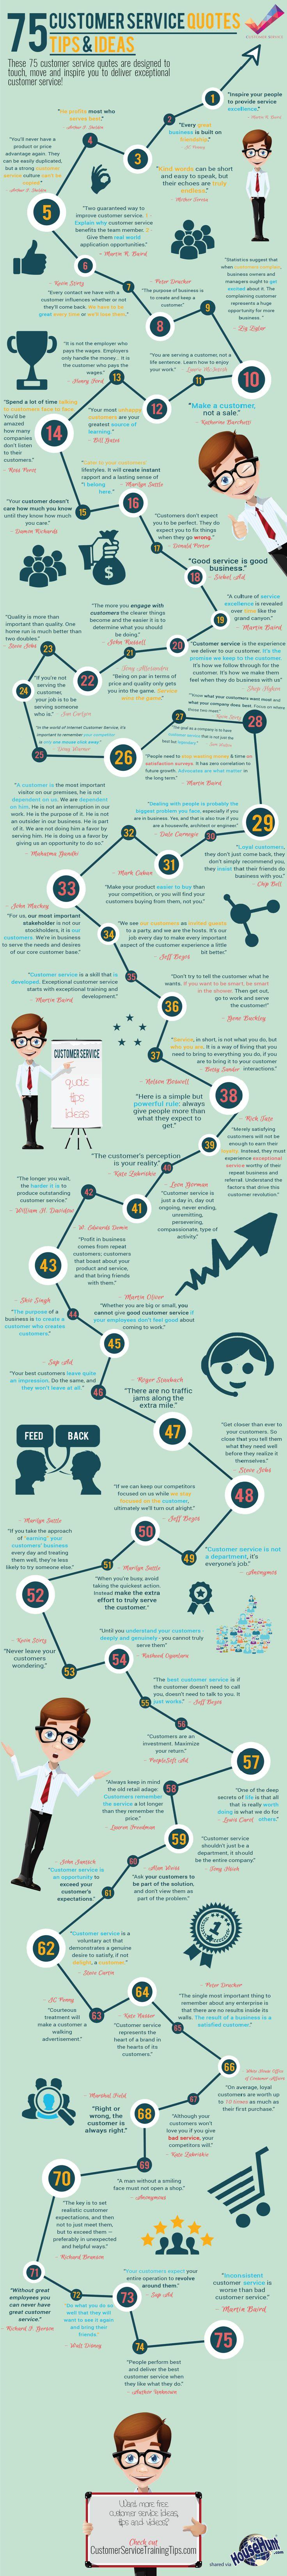 75 Unique Customer Service Quotes [Infographic]